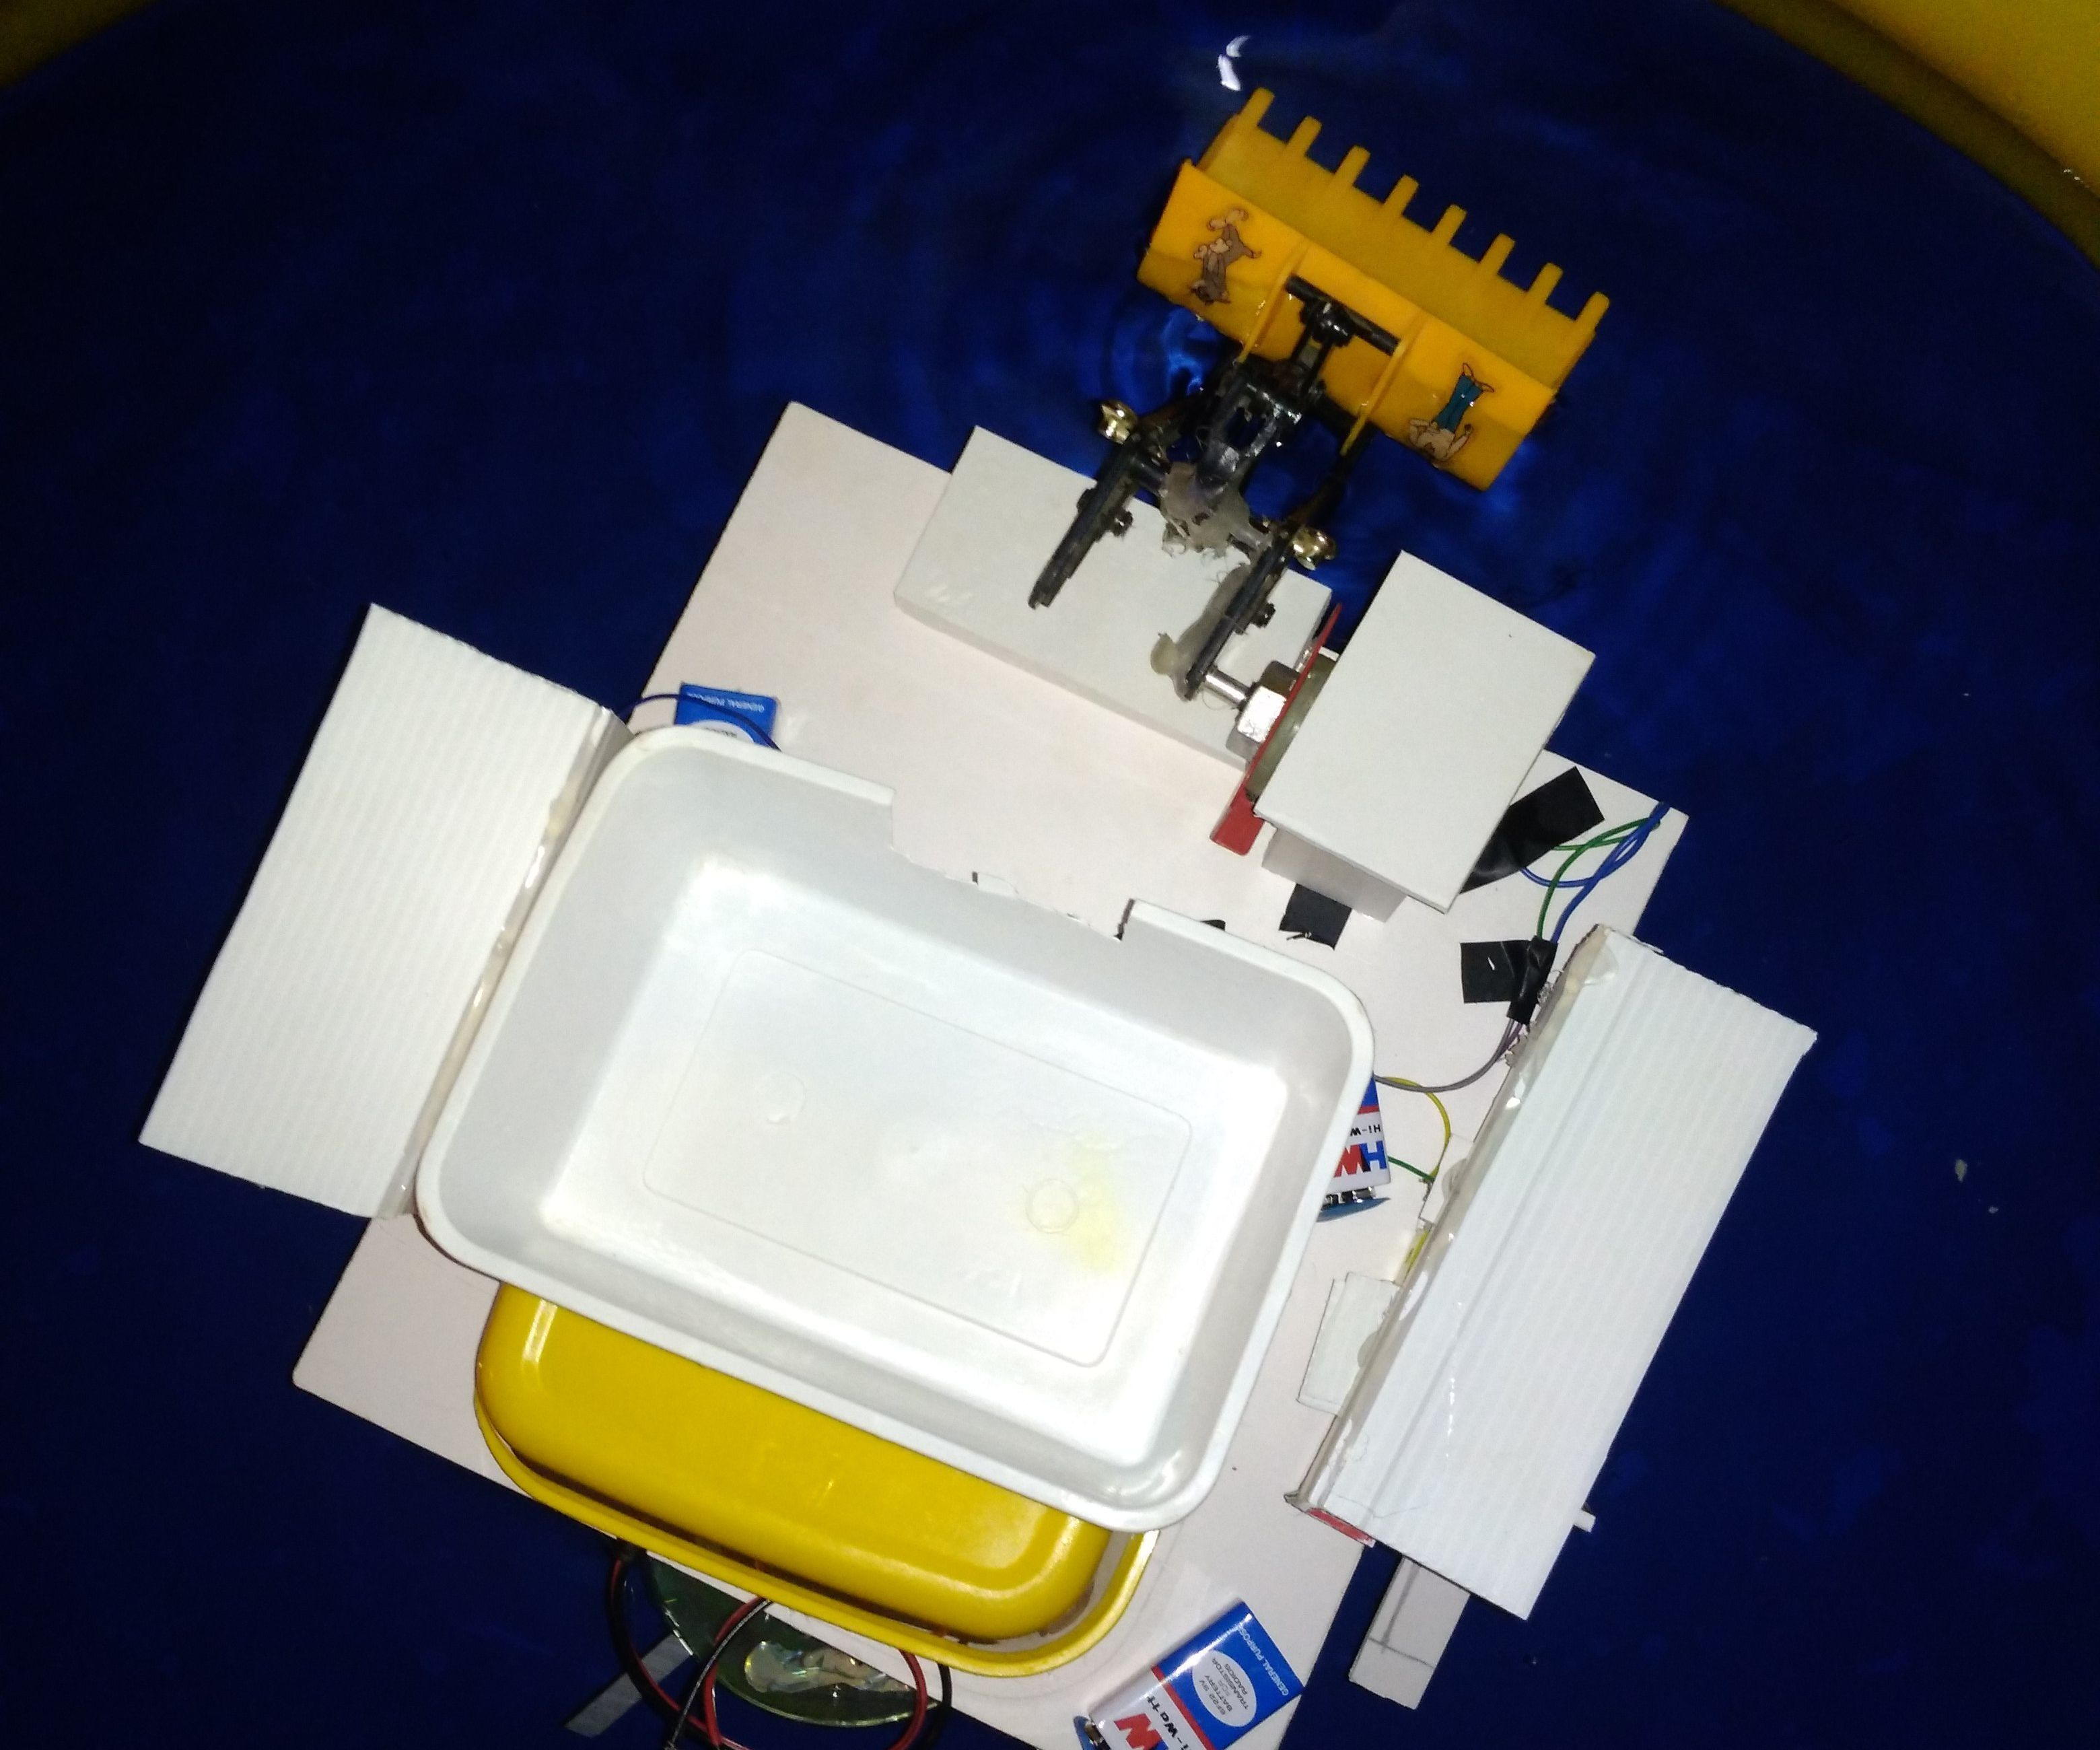 Wbc-bot(Water Body Cleaner - Bot)